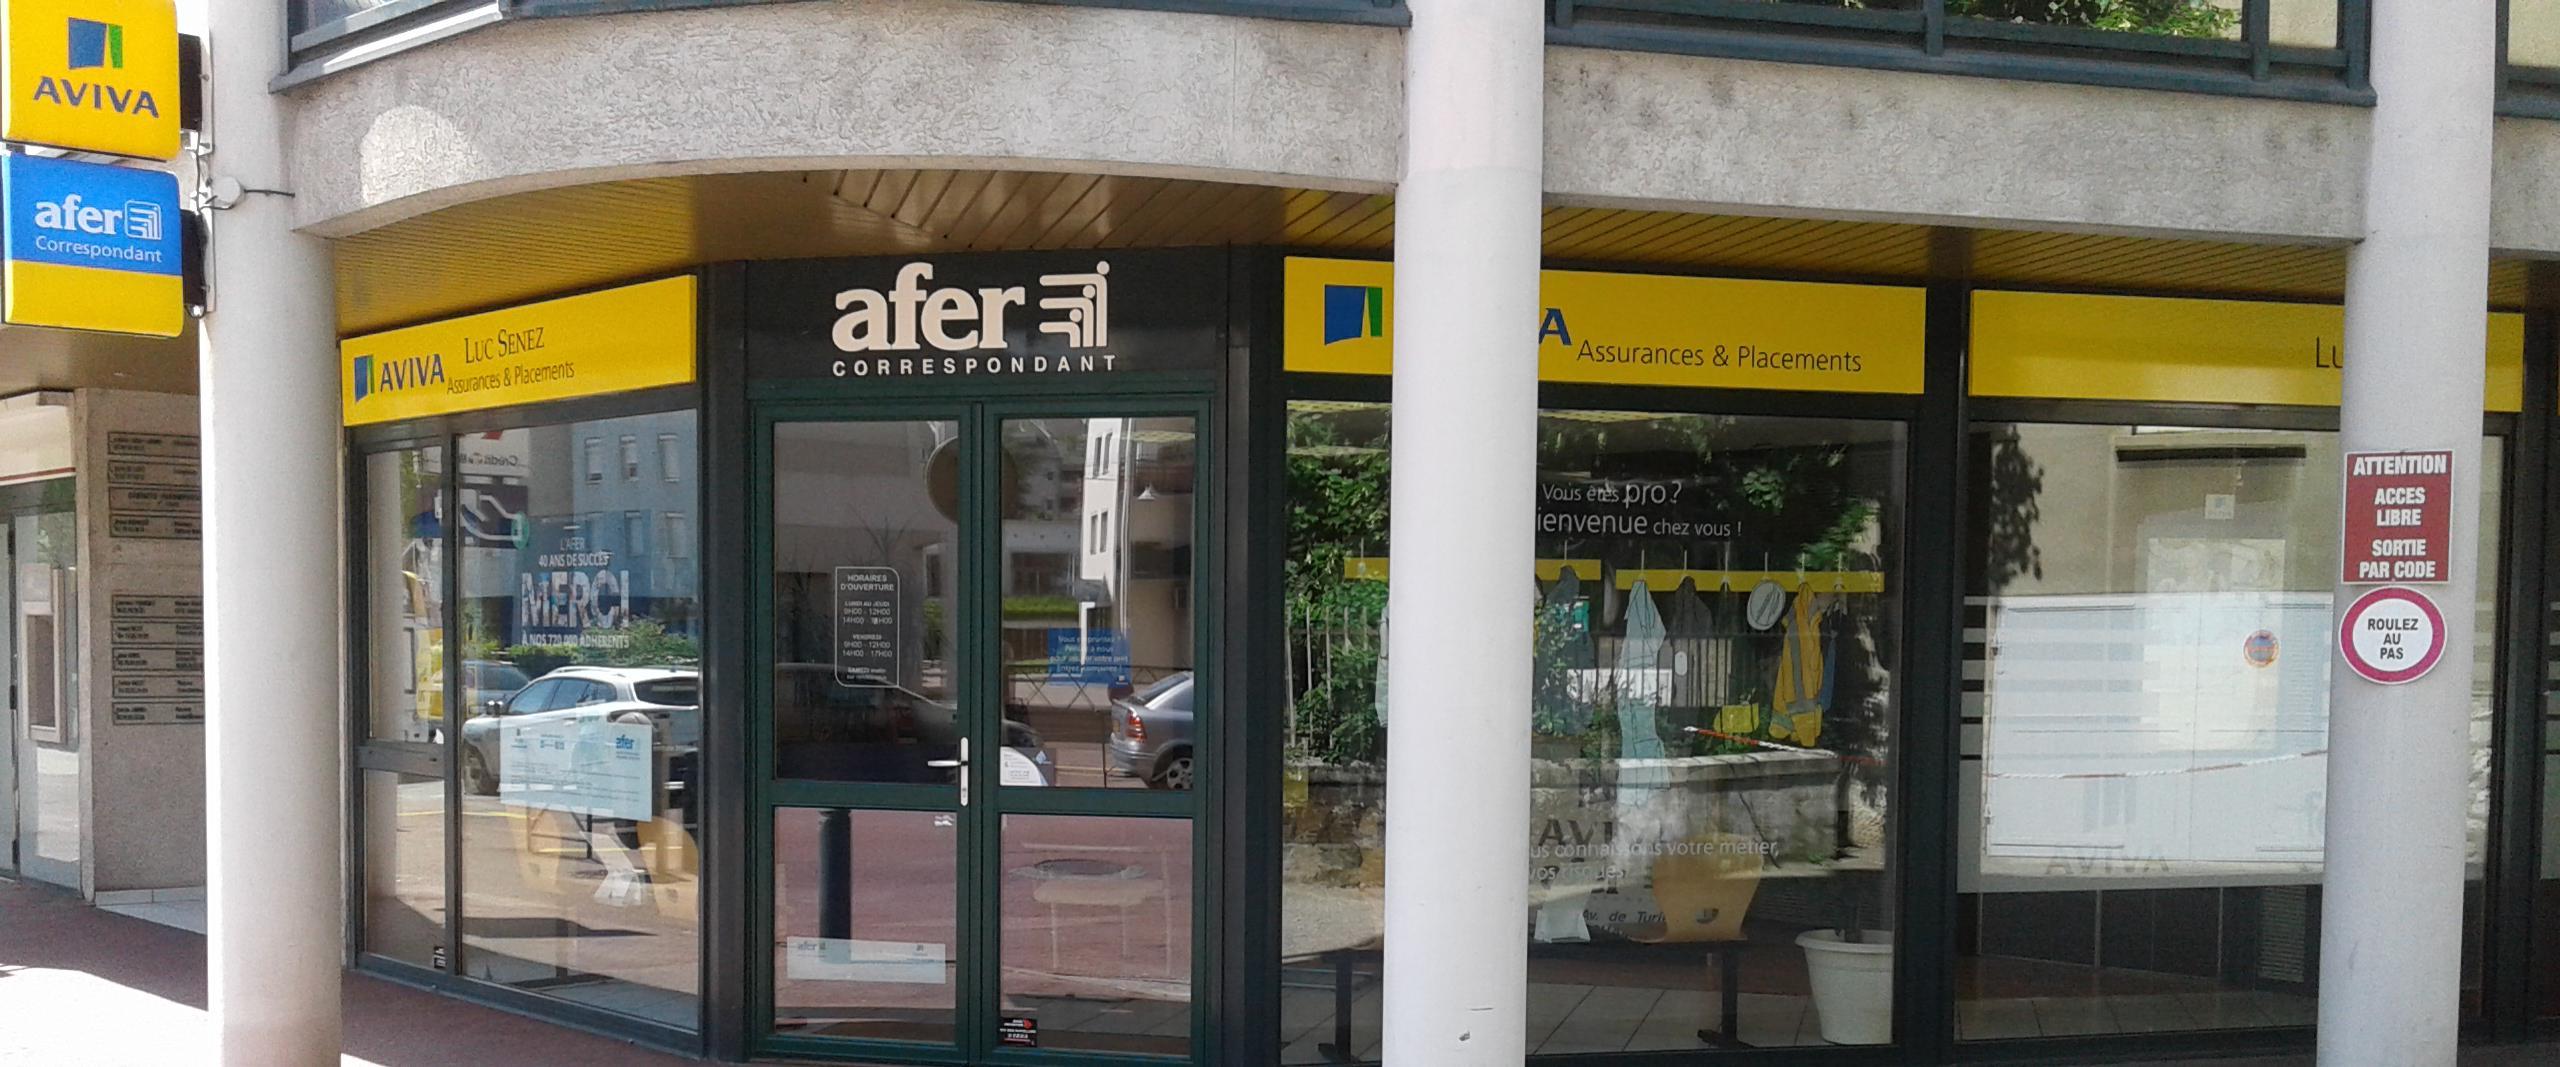 agence assurance CHAMBERY Alpes avenue de TURIN